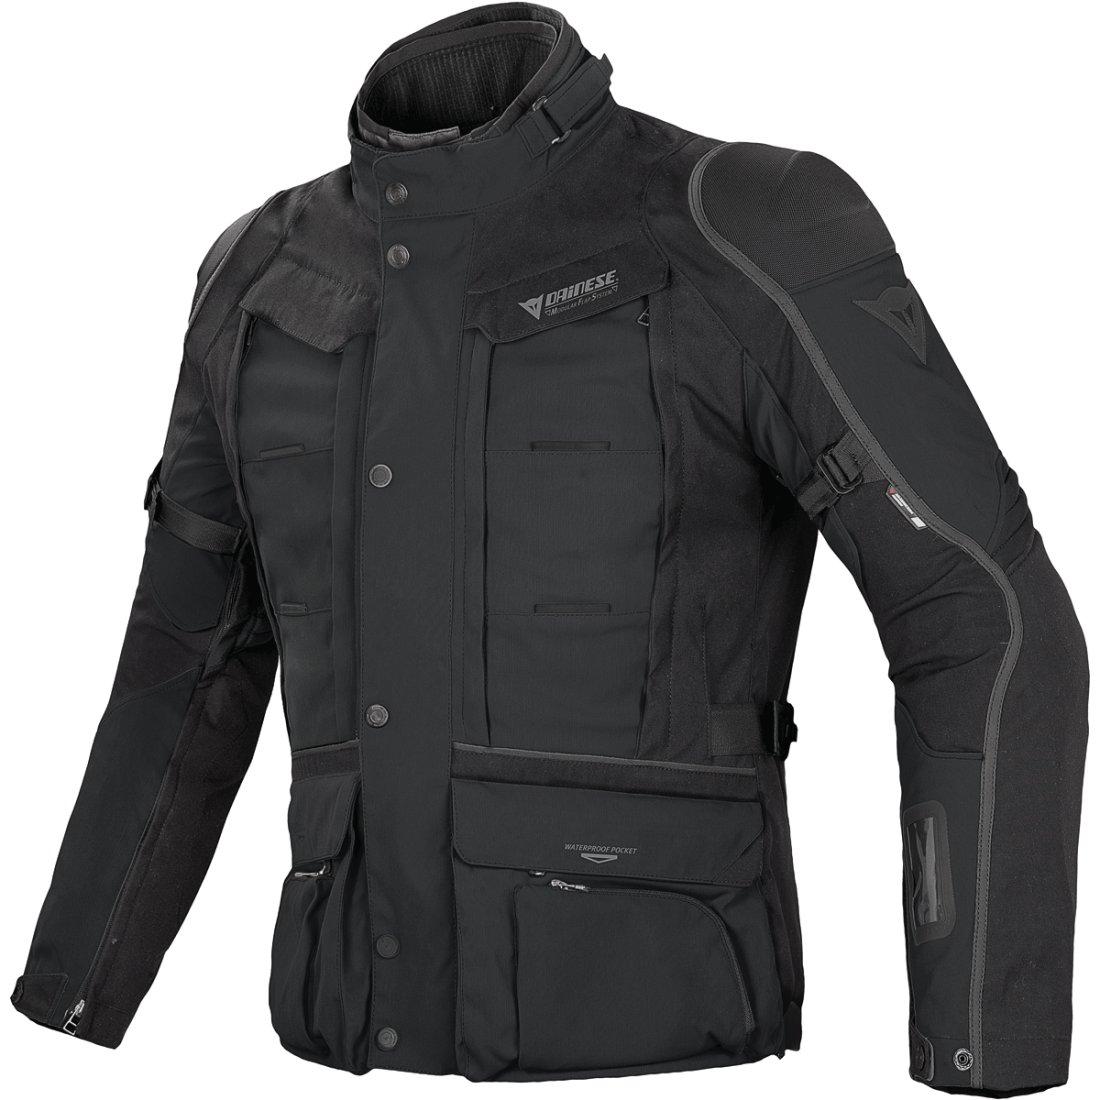 dainese d explorer gore tex black dark gull grey jacket. Black Bedroom Furniture Sets. Home Design Ideas